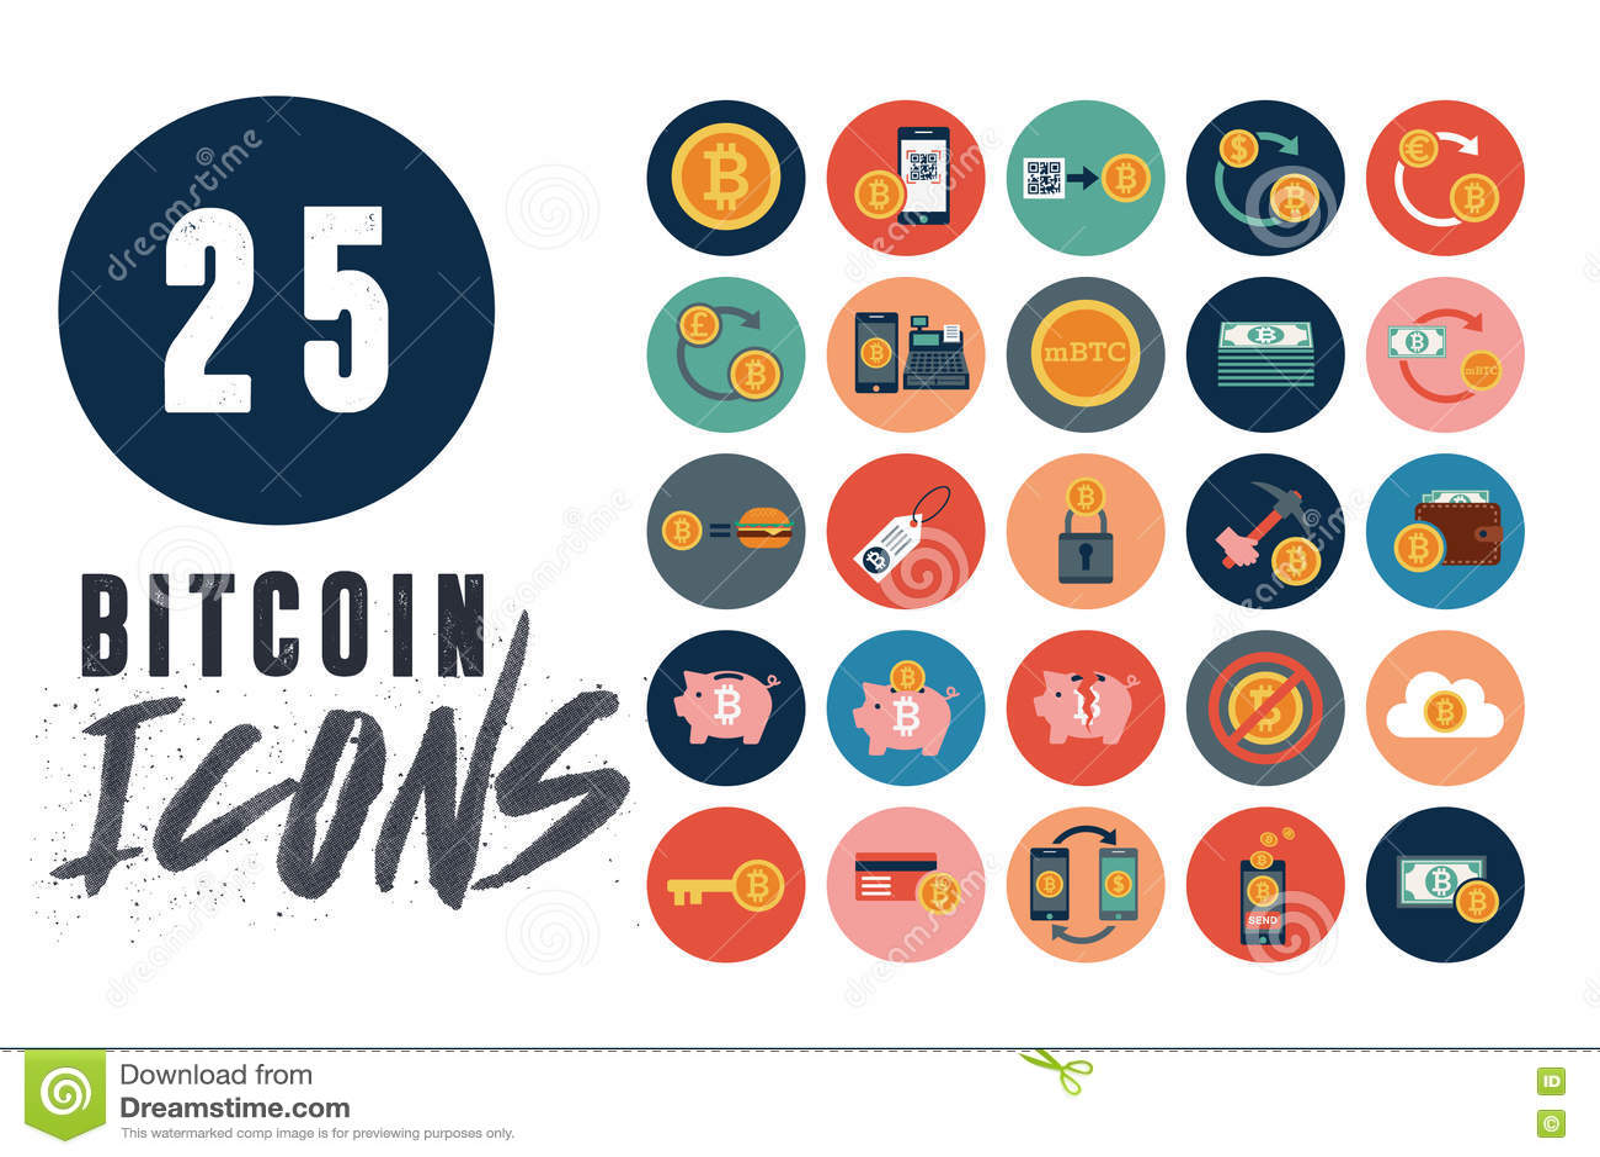 Bitcoins Investment Business Icons Vector Illustration | CartoonDealer.com #91337306